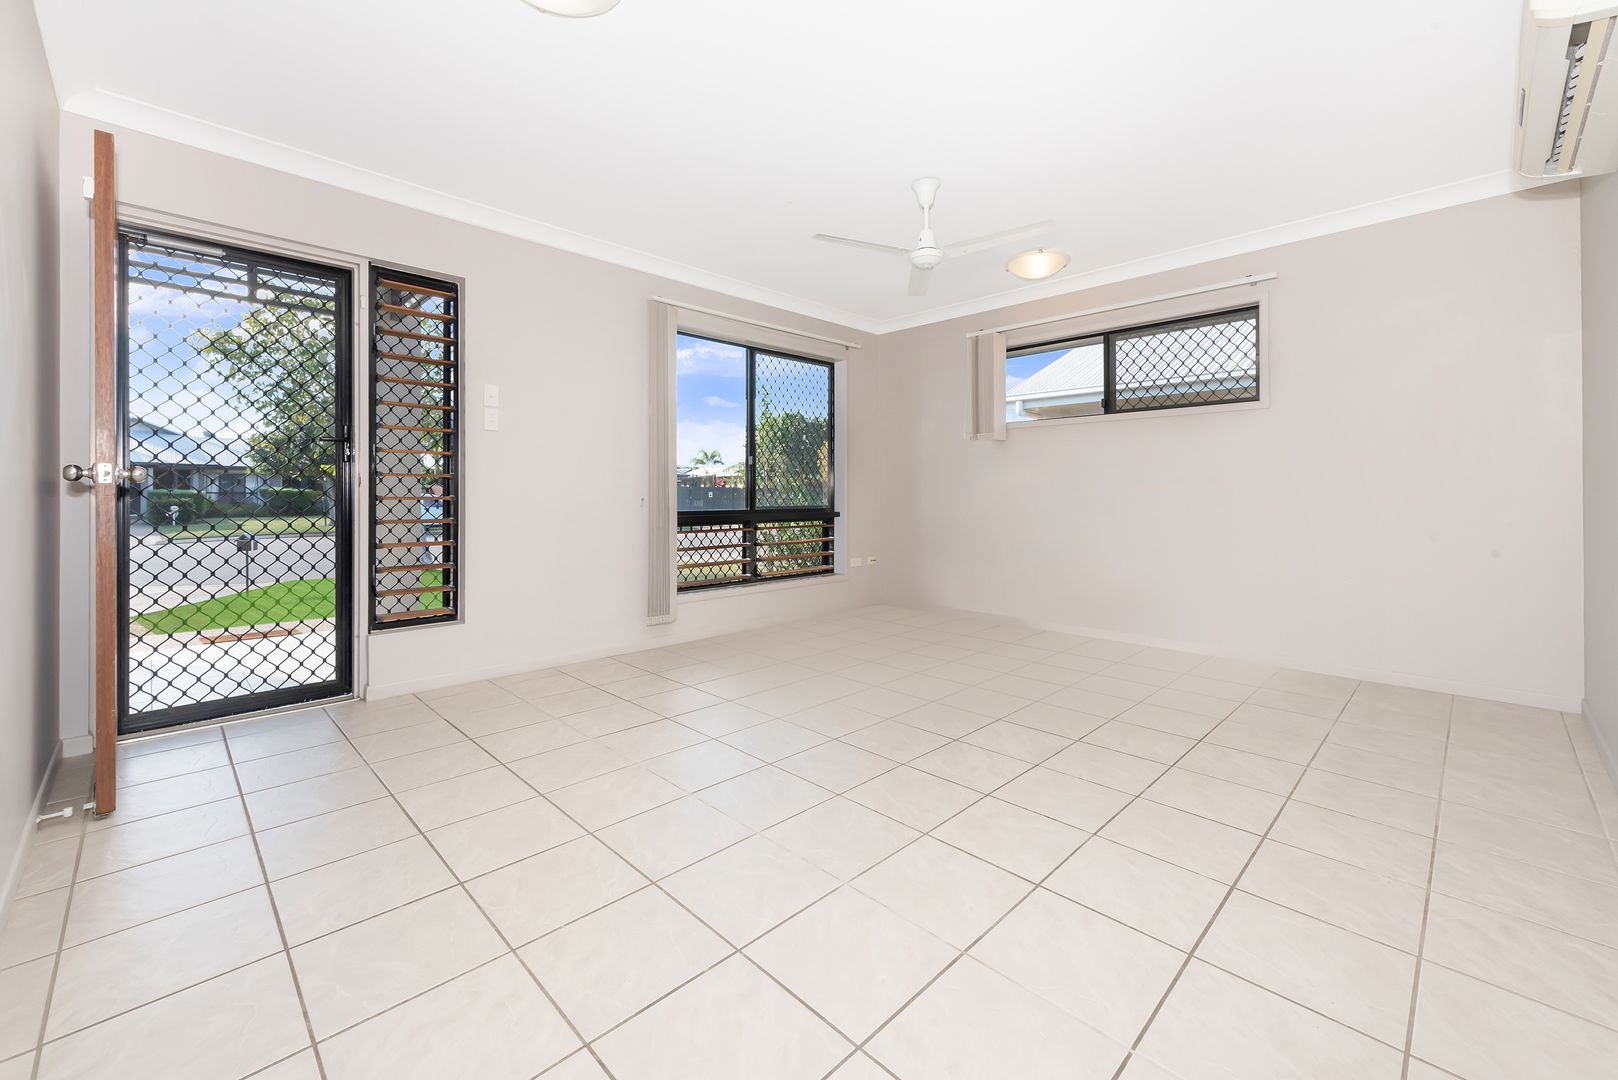 10 Beresford Court, Kirwan QLD 4817, Image 1